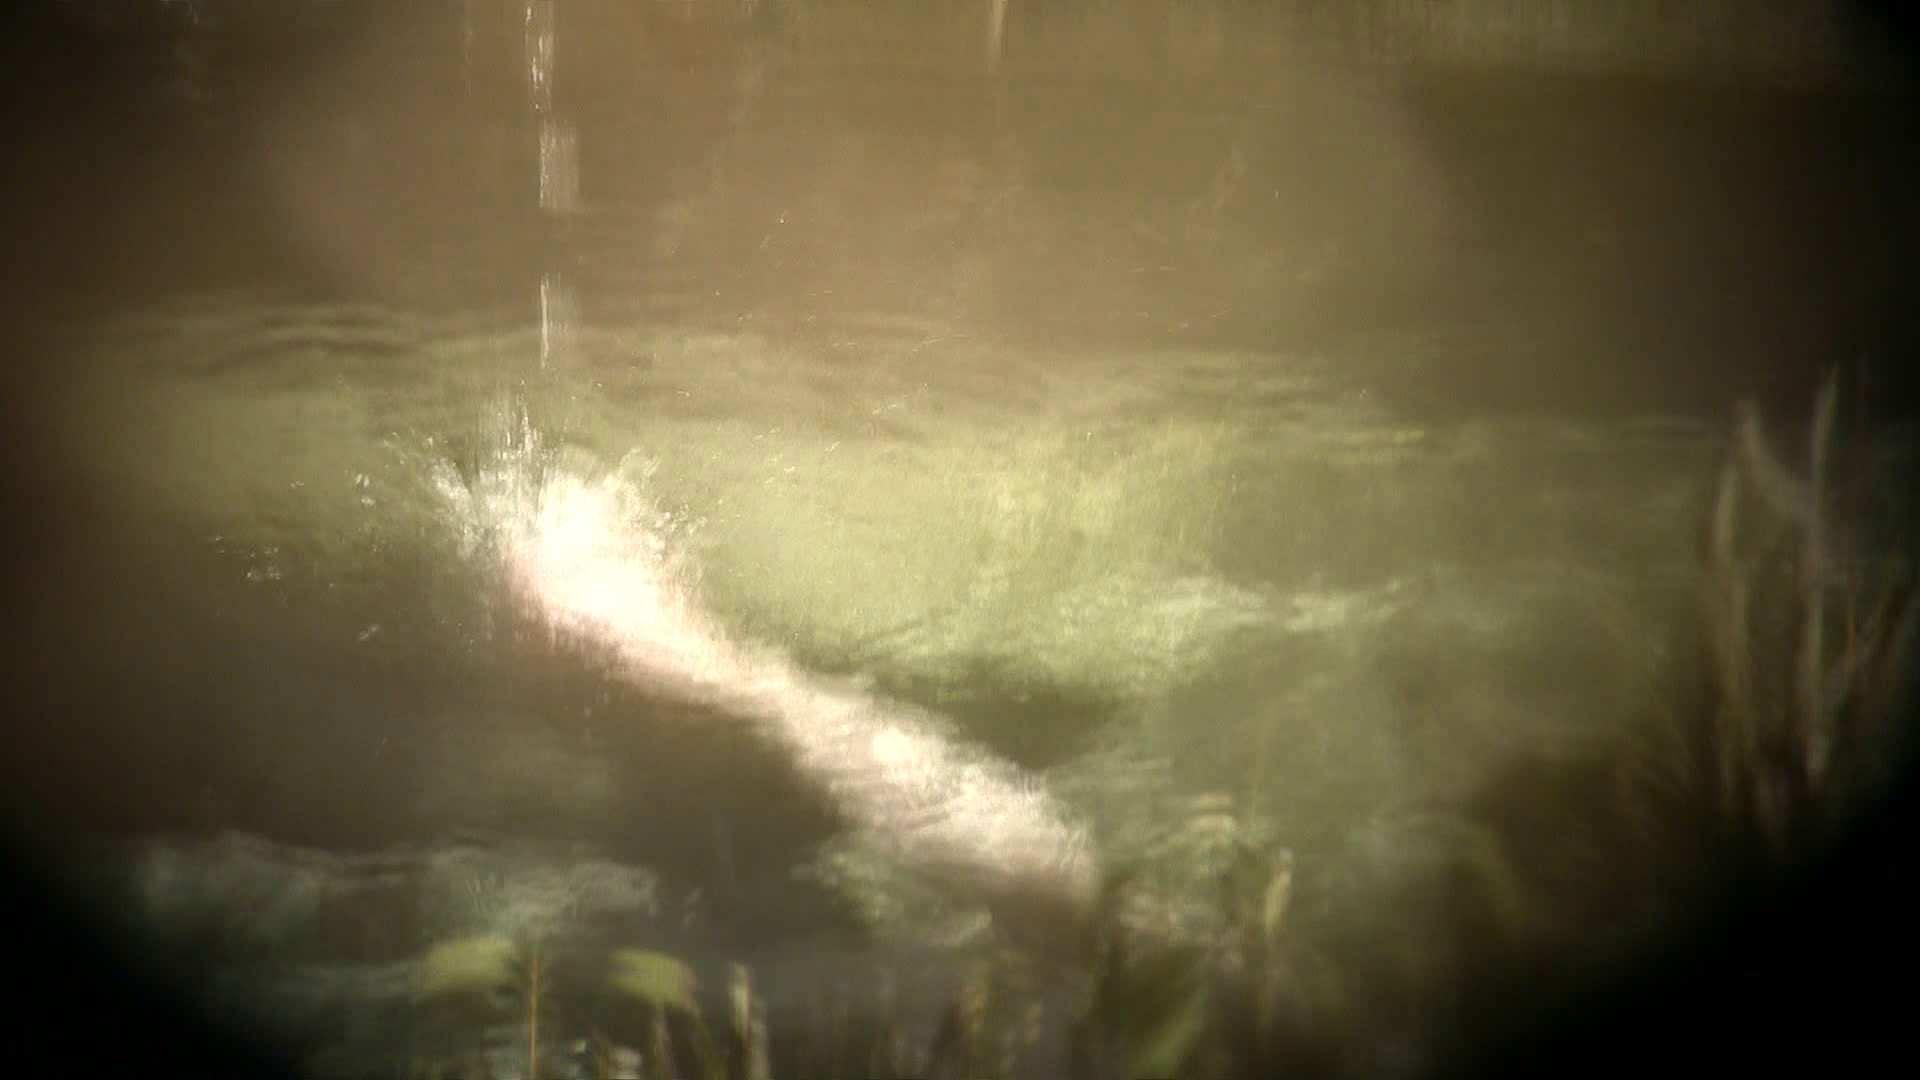 Aquaな露天風呂Vol.698 盗撮 | HなOL  86pic 56